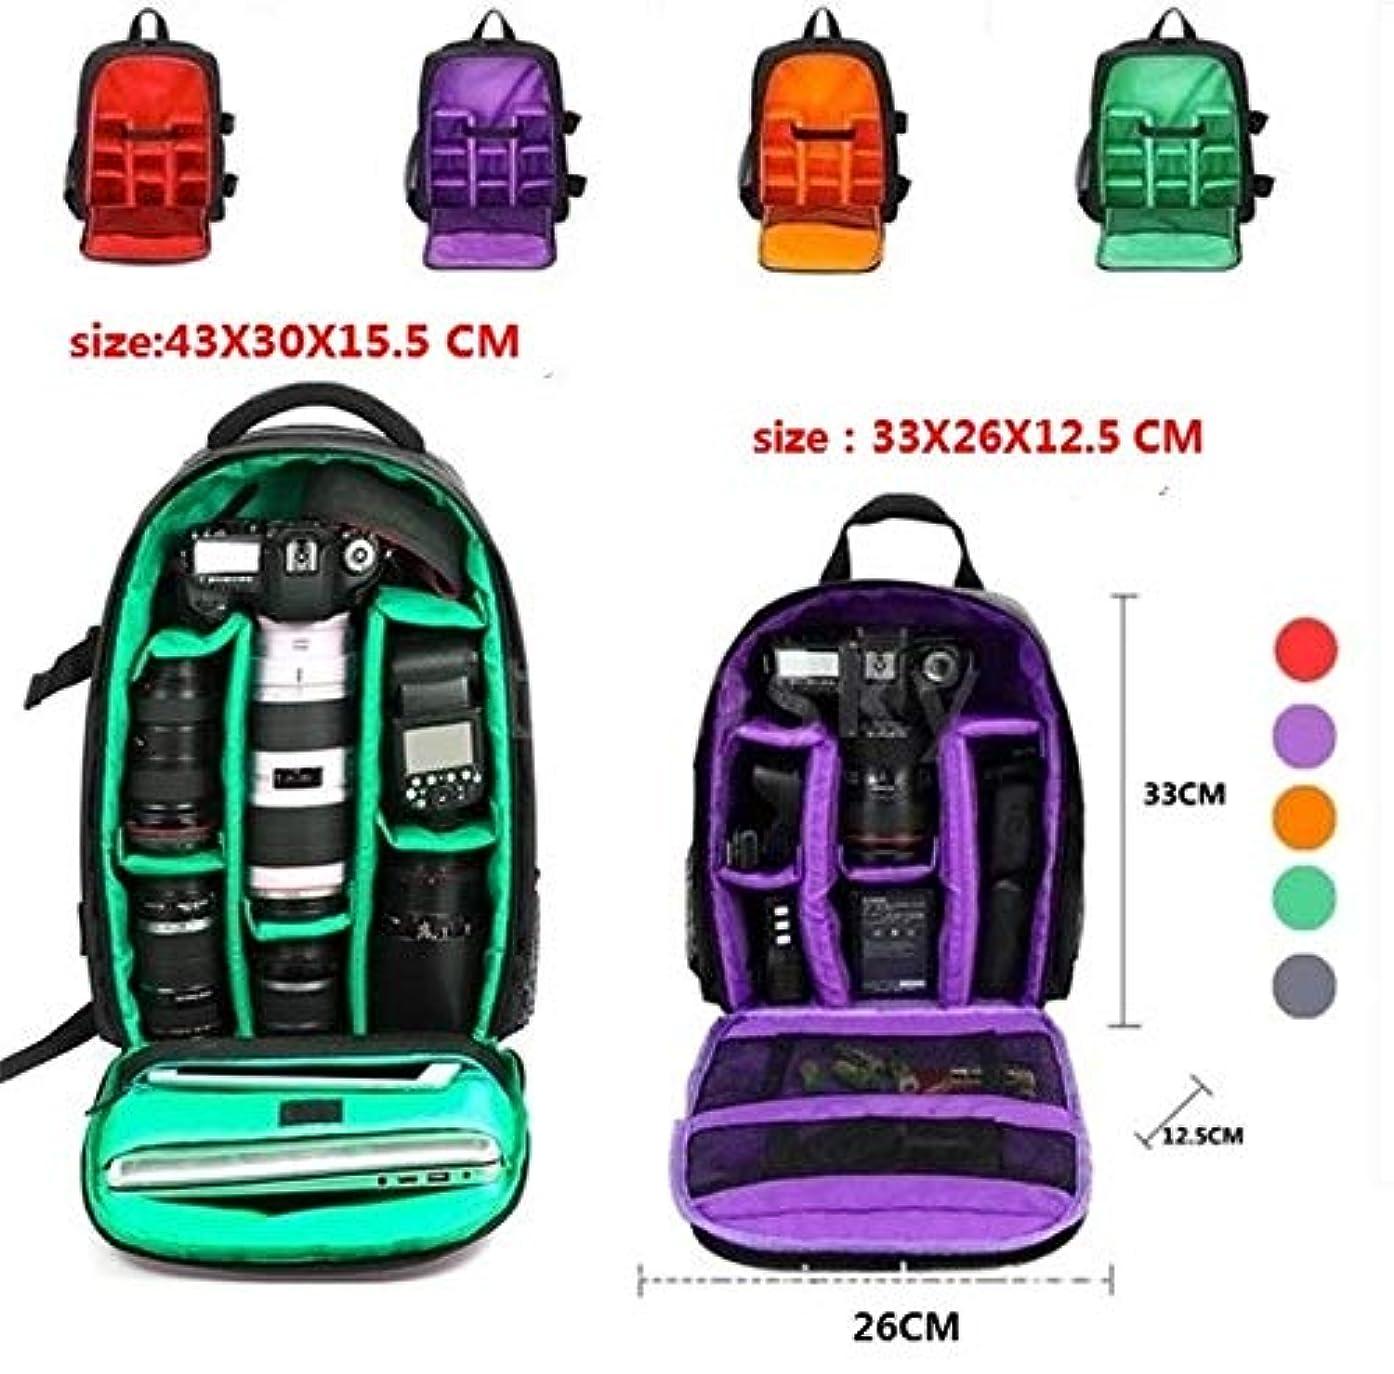 Hot New Outdoor Photo Bags, Single Lens Digital Camera Bag, Waterproof, Anti-Theft, Wear-Resistant Shoulder Bag Backpack for Canon Sony Nikon DSLR SLR Digital Camera (Grey,43X30X15.5 cm)